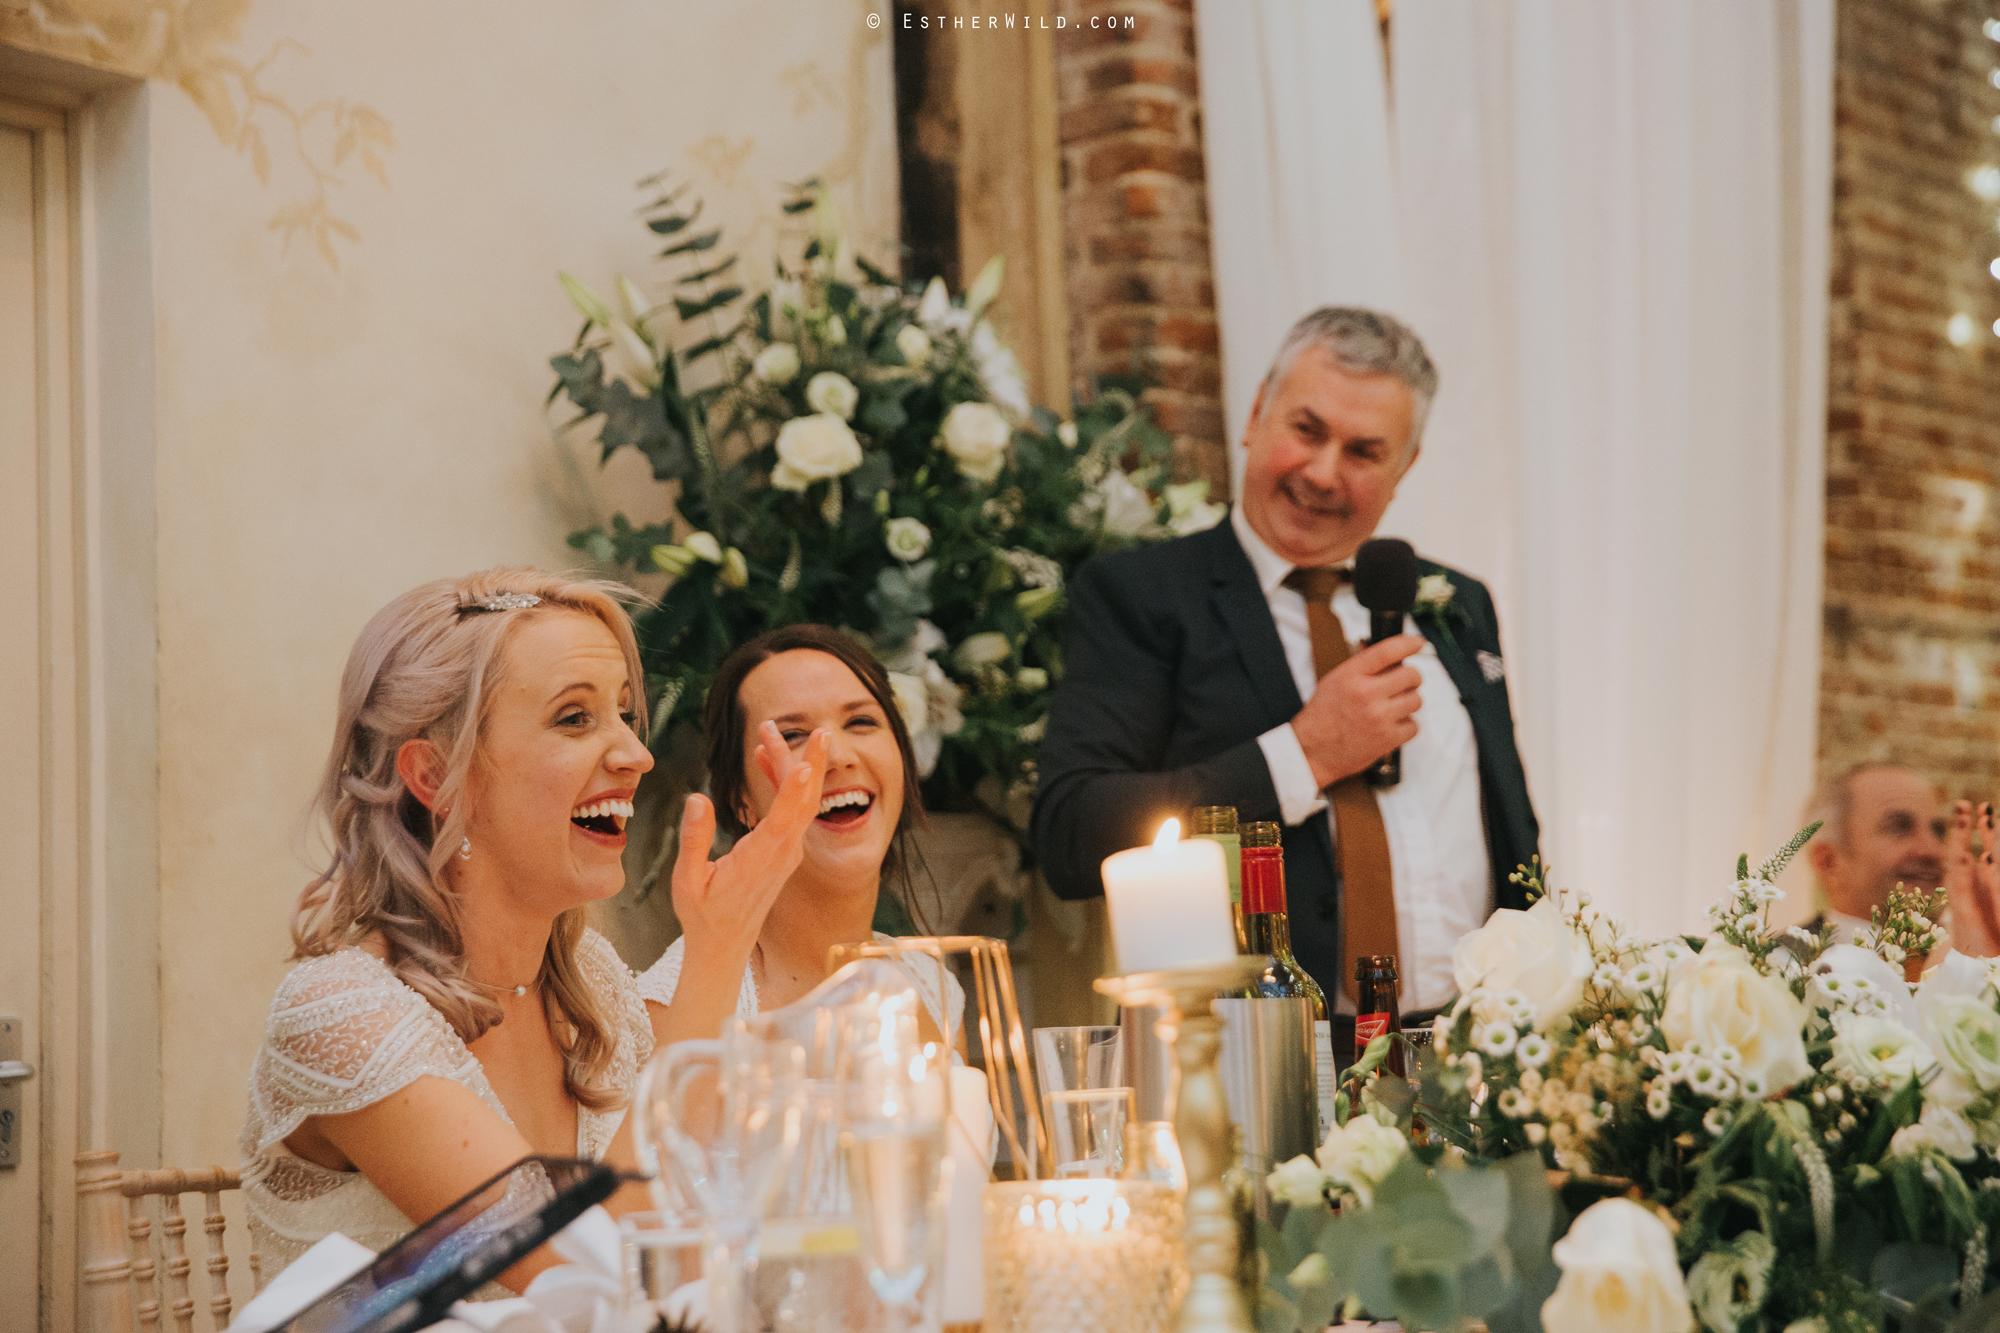 Elms_Barn_Weddings_Suffolk_Photographer_Copyright_Esther_Wild_IMG_2511.jpg